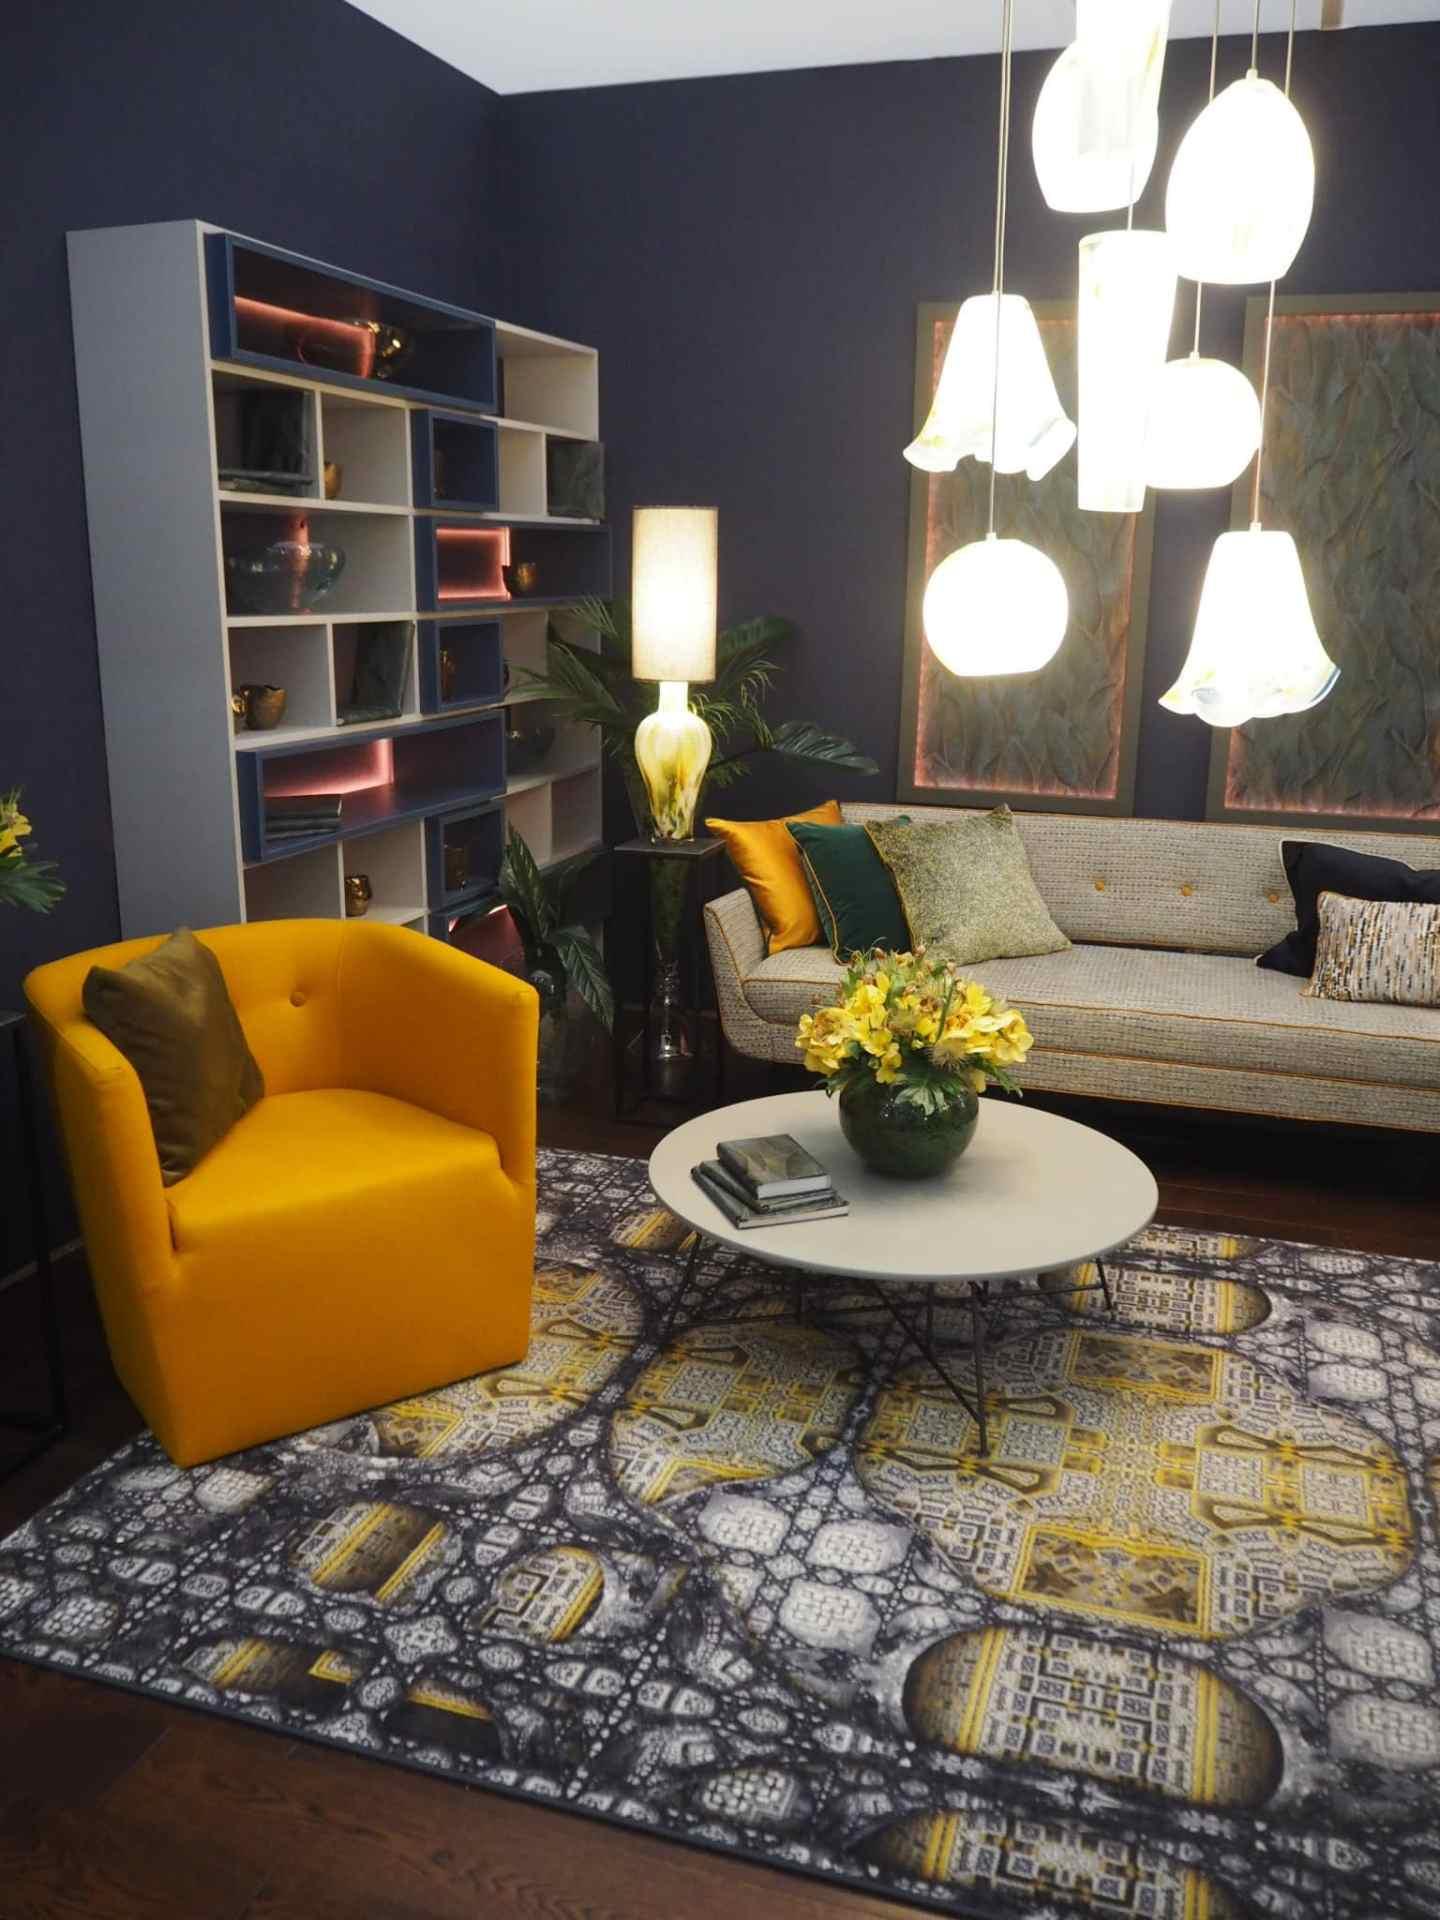 Mustard tones, with beautiful orange piping on the sofa